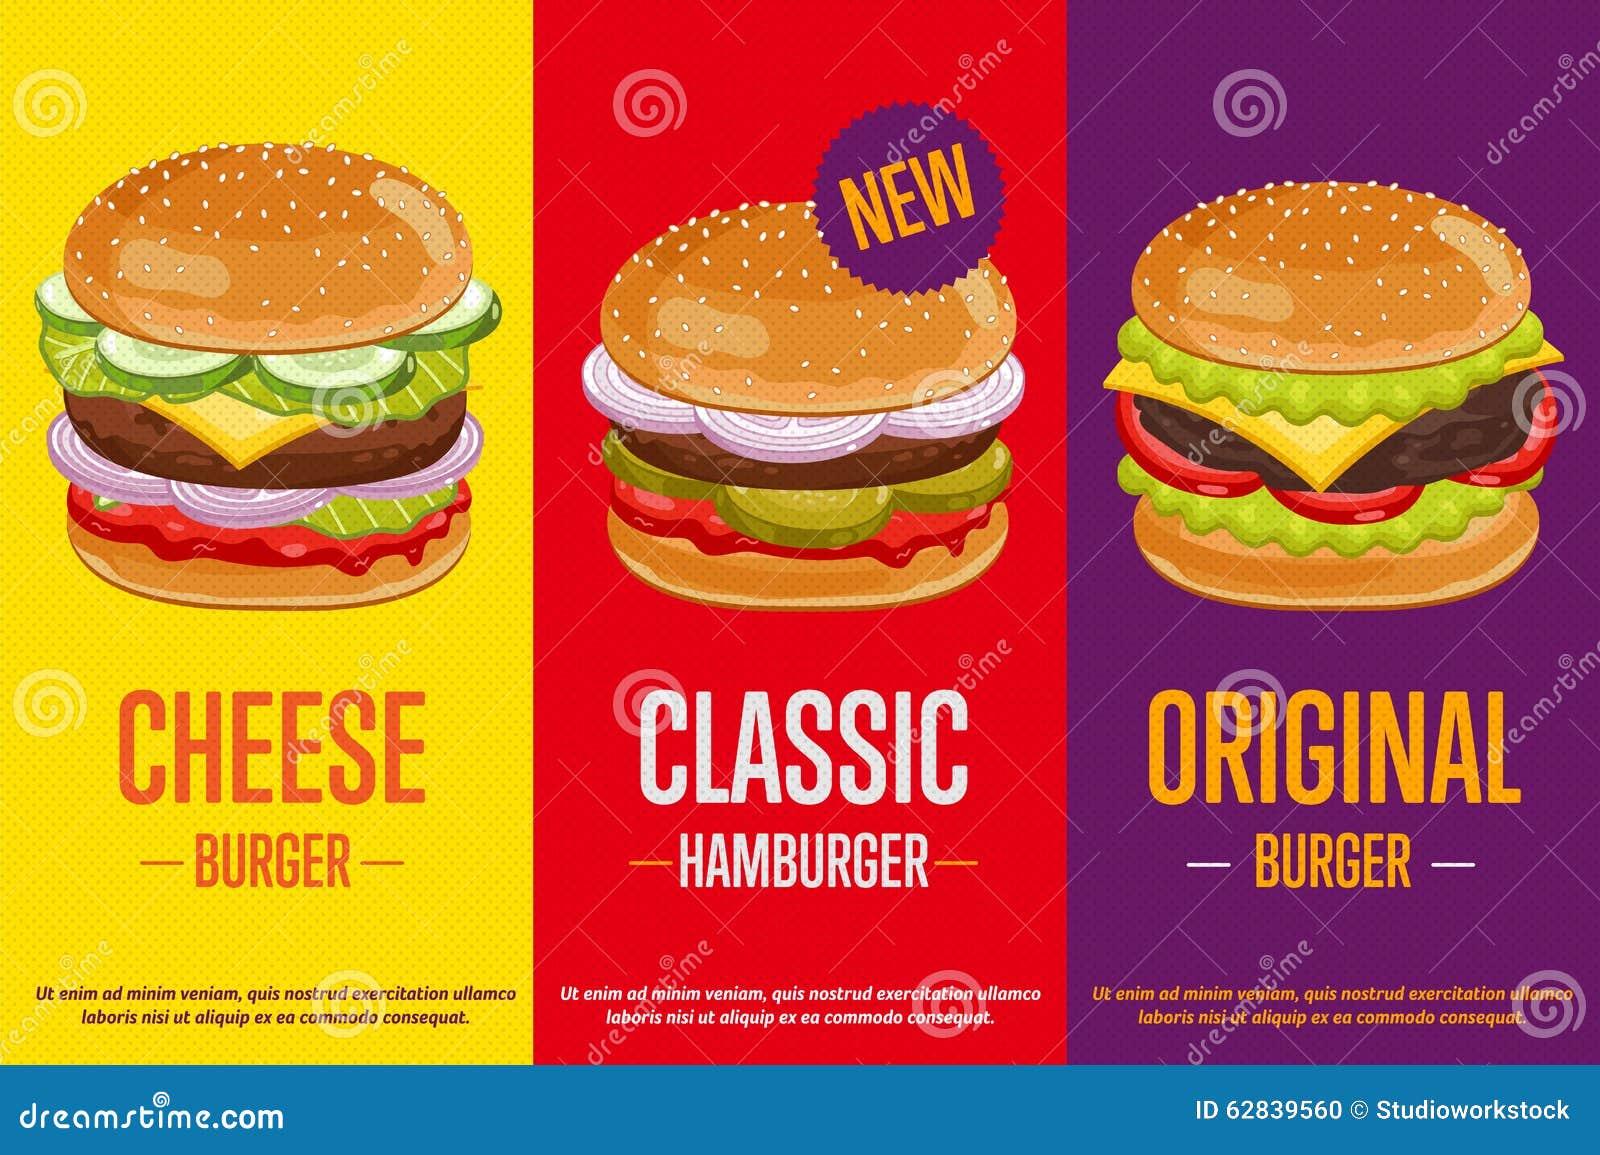 Burgers Menu Template Illustration 62839560